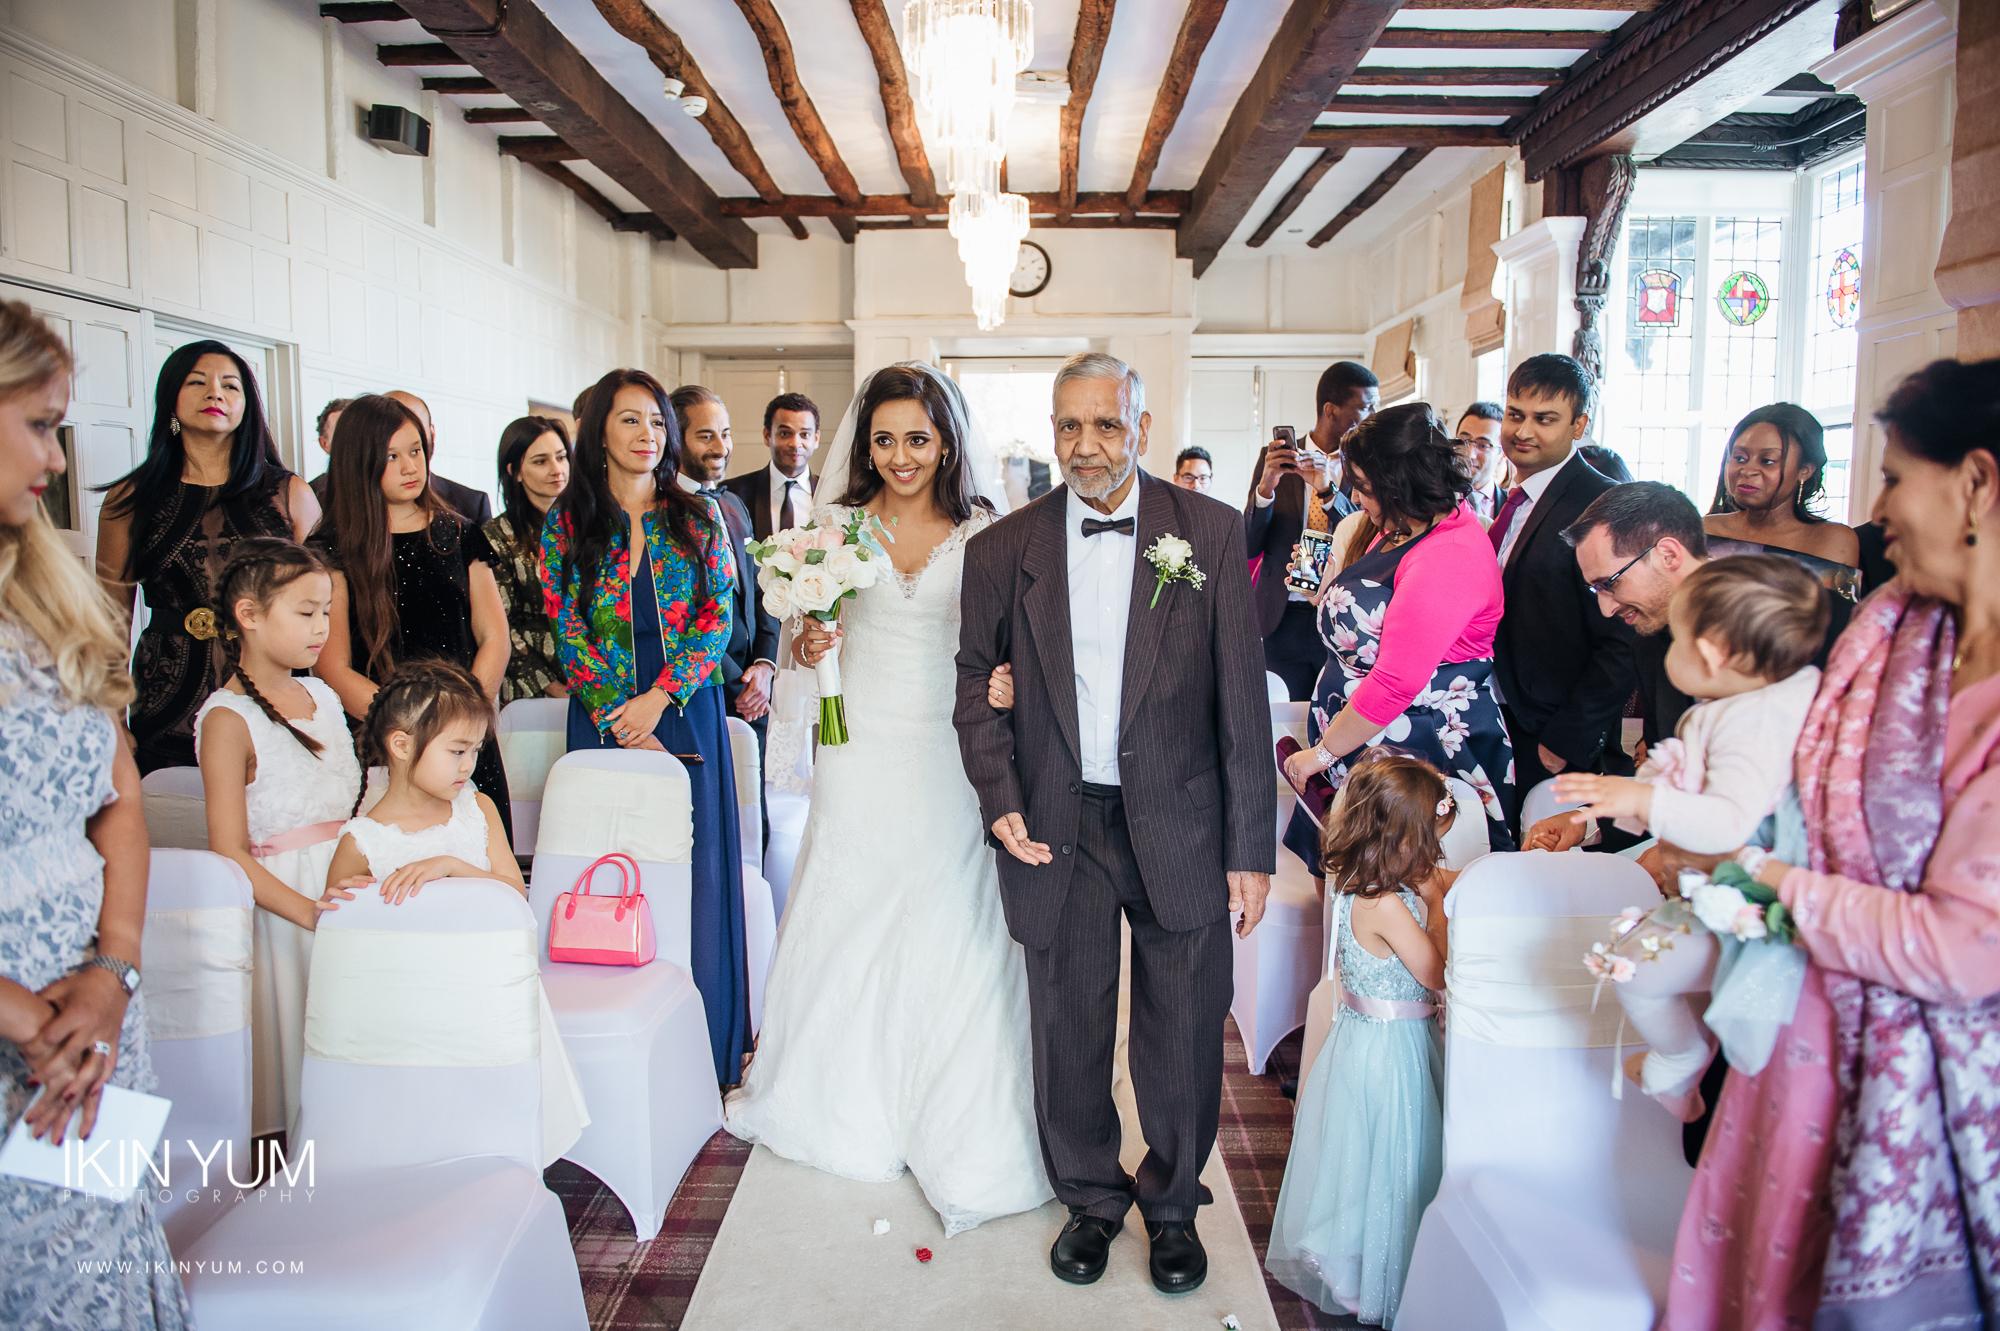 Laura Ashley Manor Wedding - Ikin Yum Photography-043.jpg